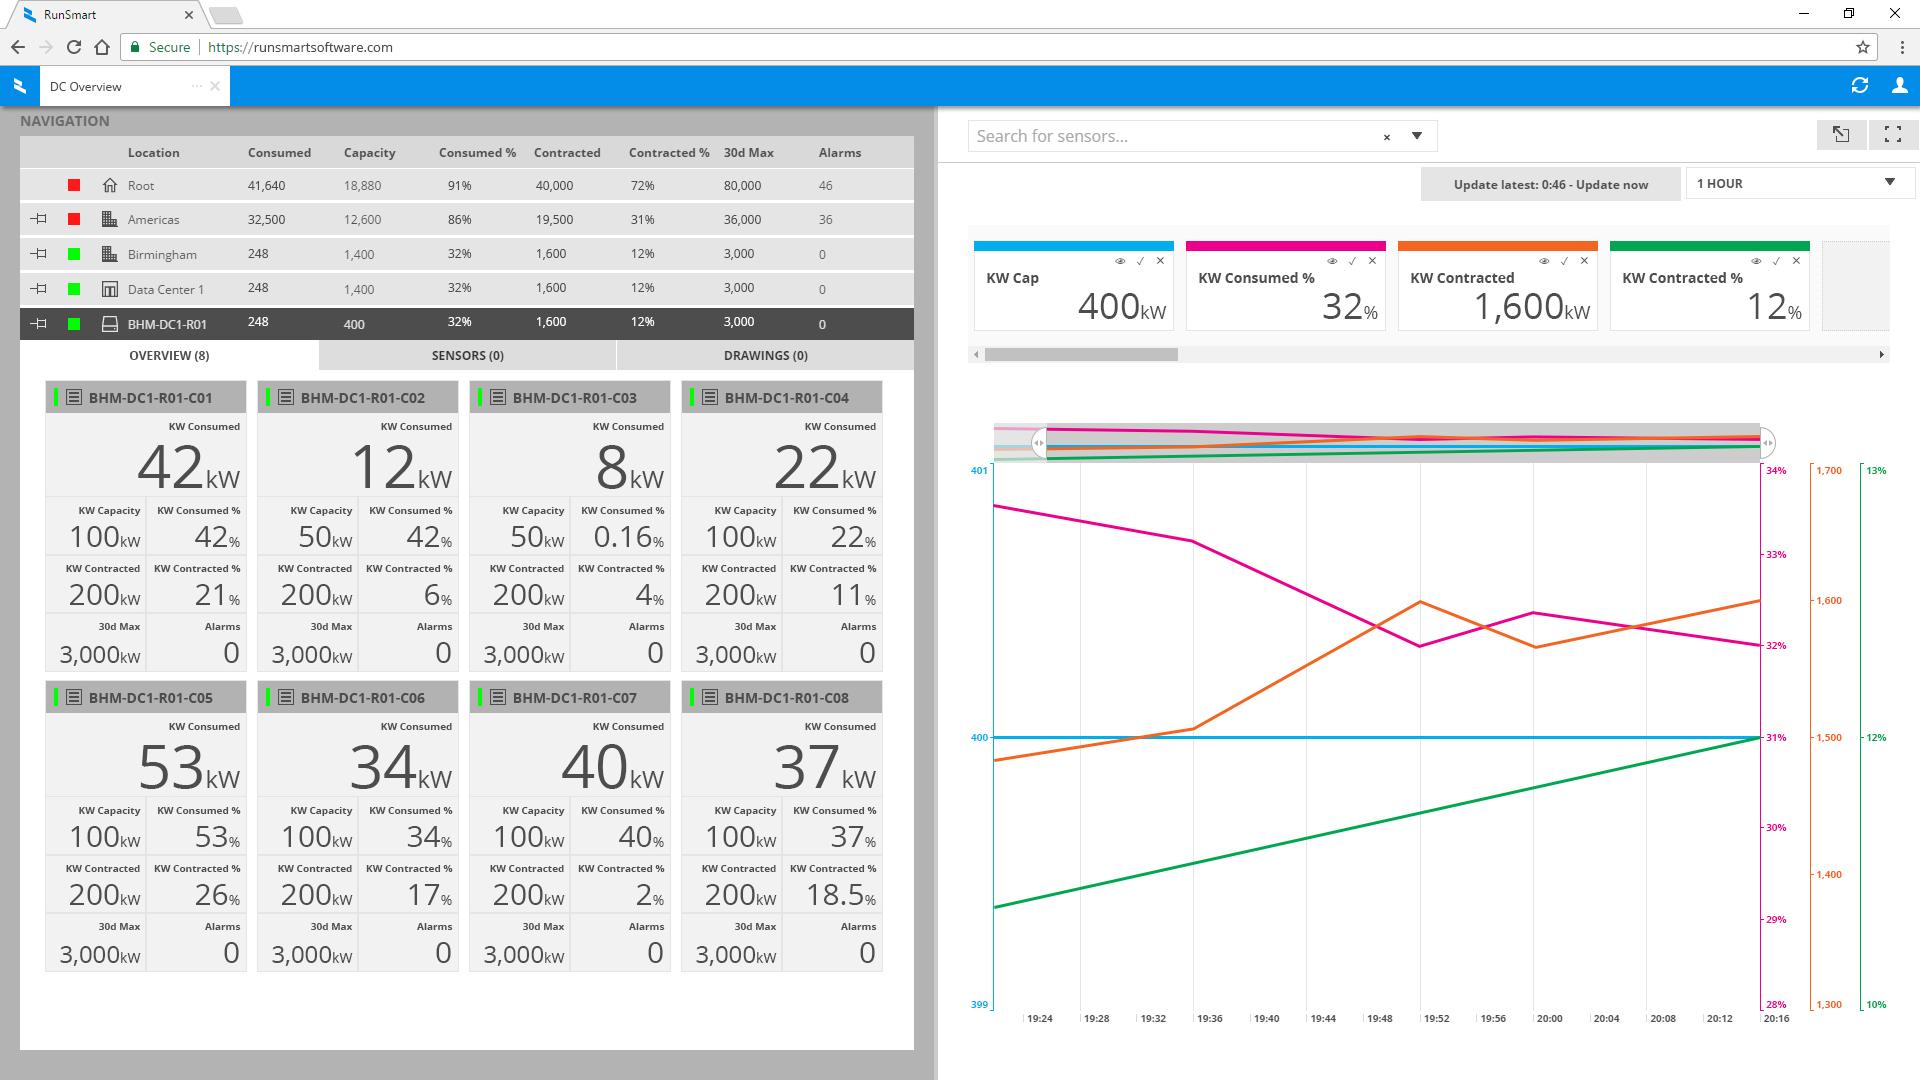 Asset Overview Dashboard